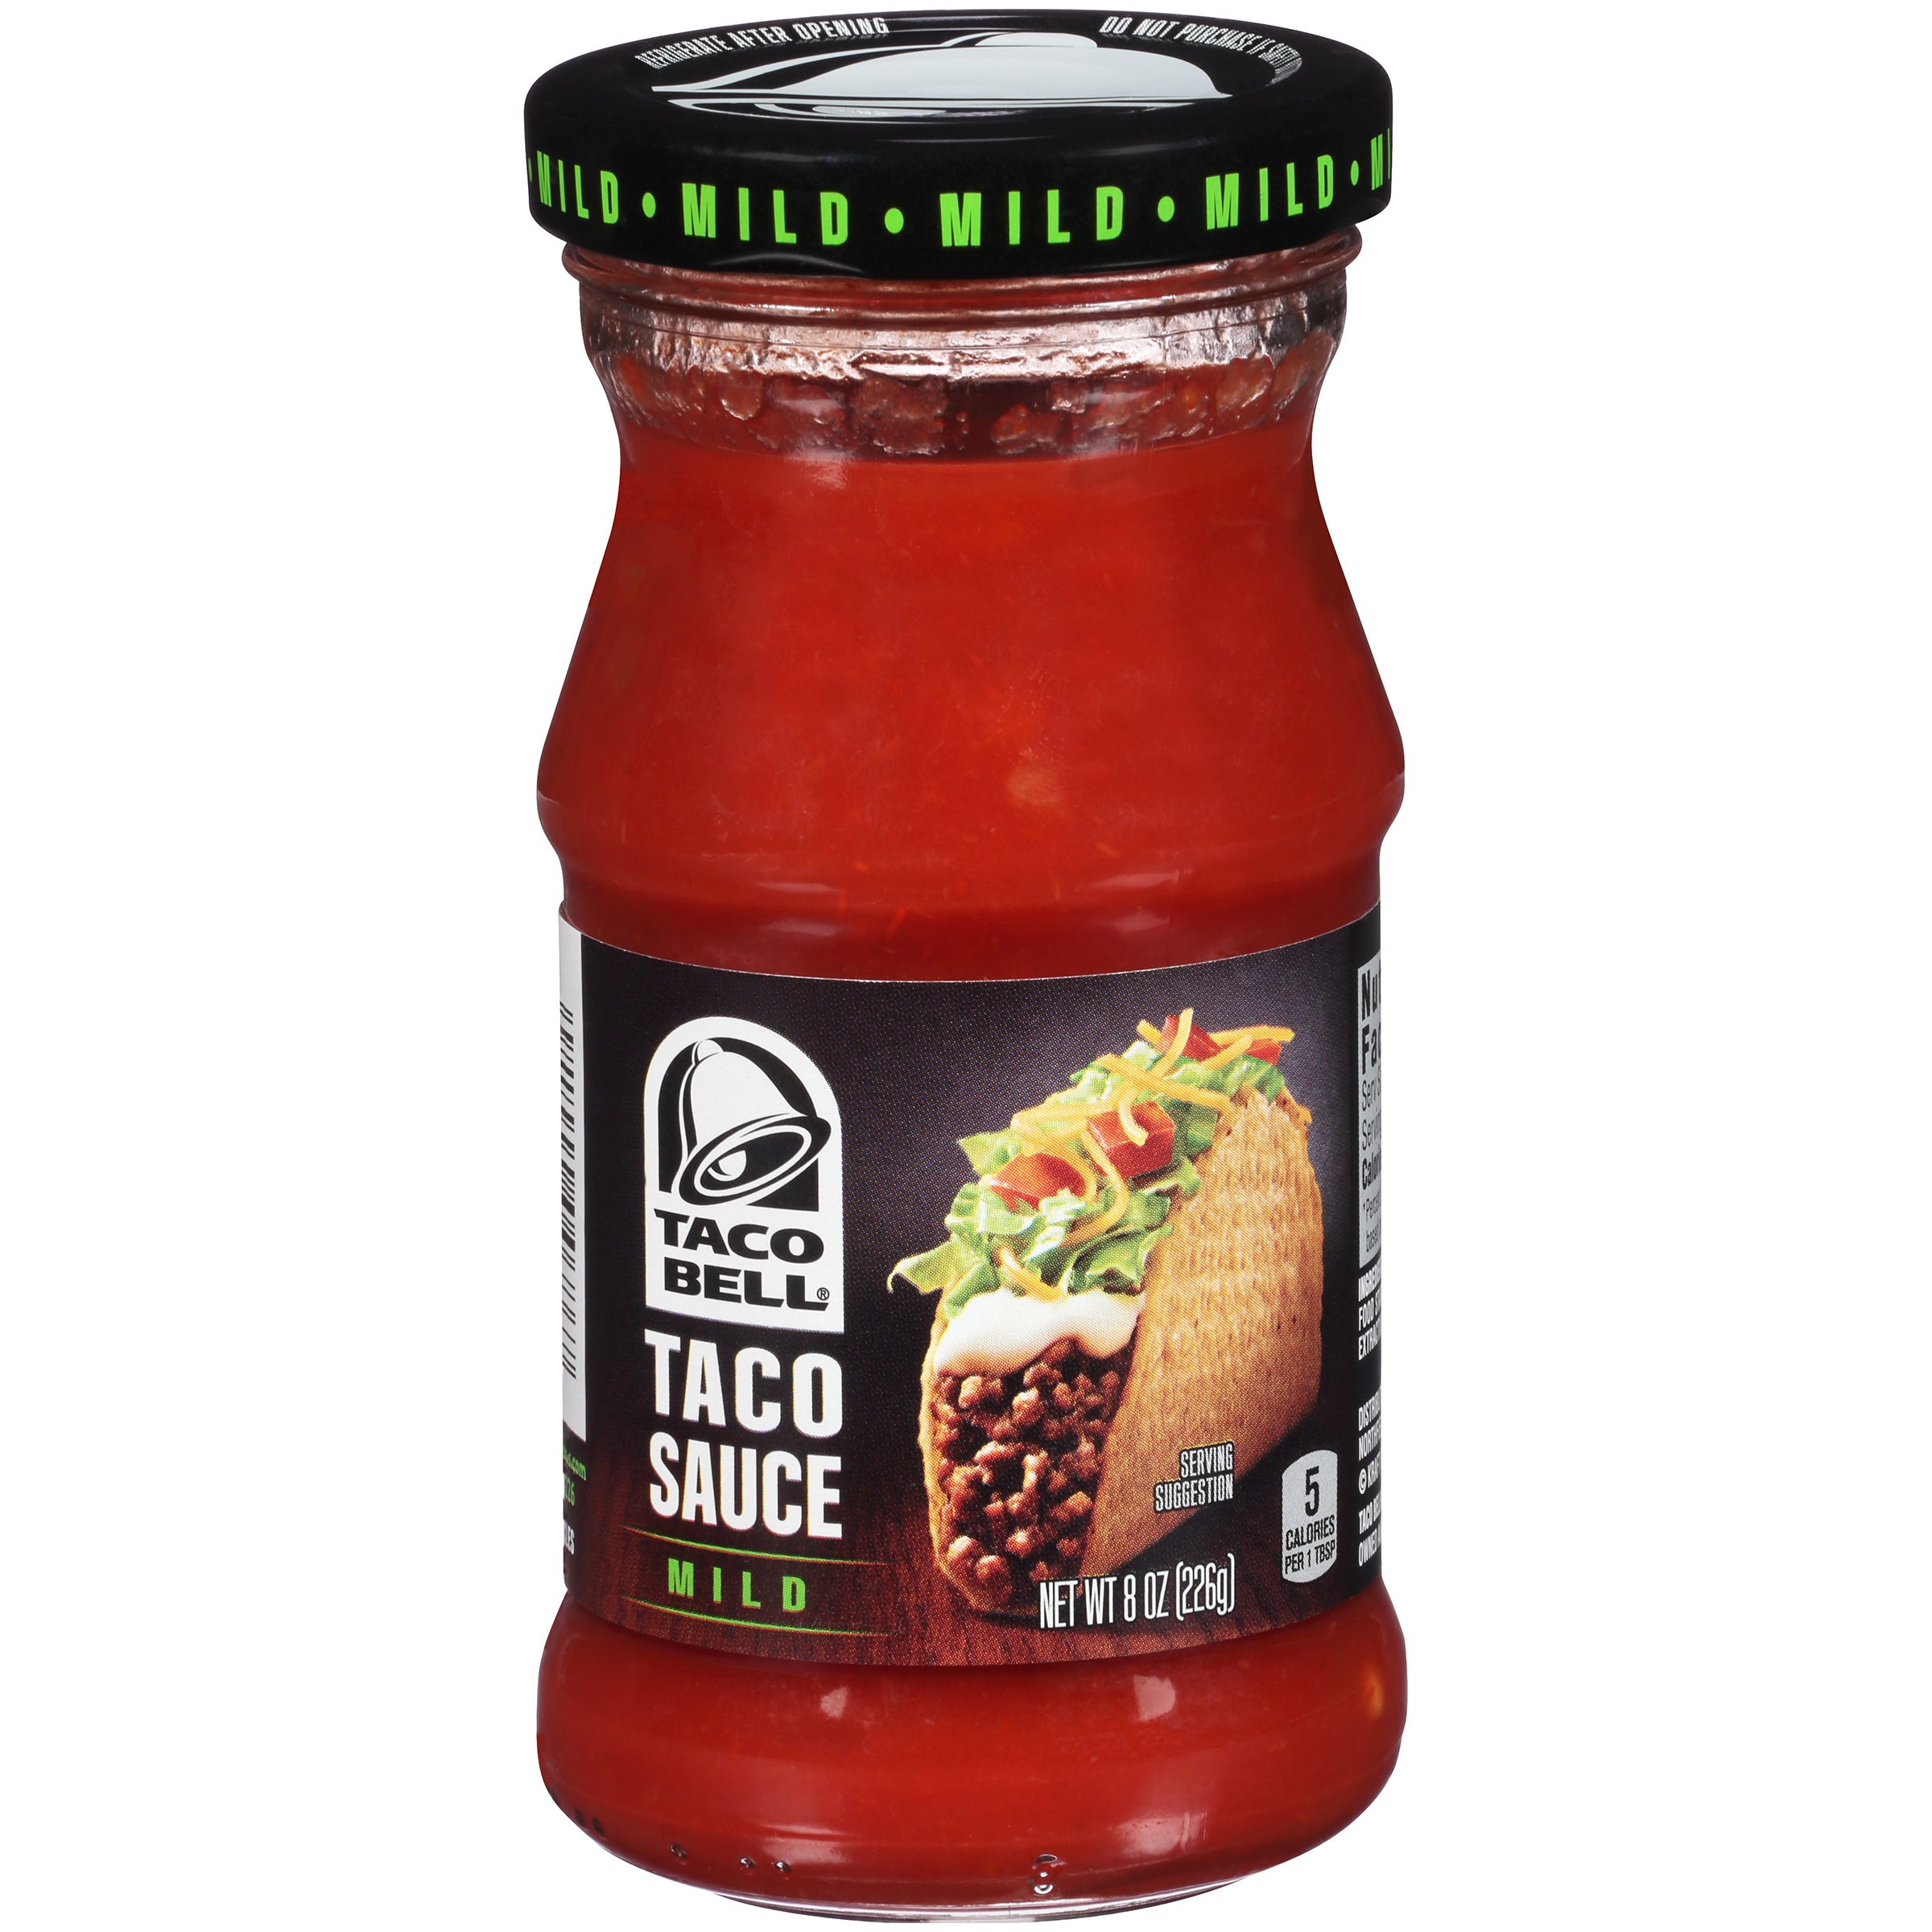 Taco Bell Mild Taco Sauce 8 oz. Jar